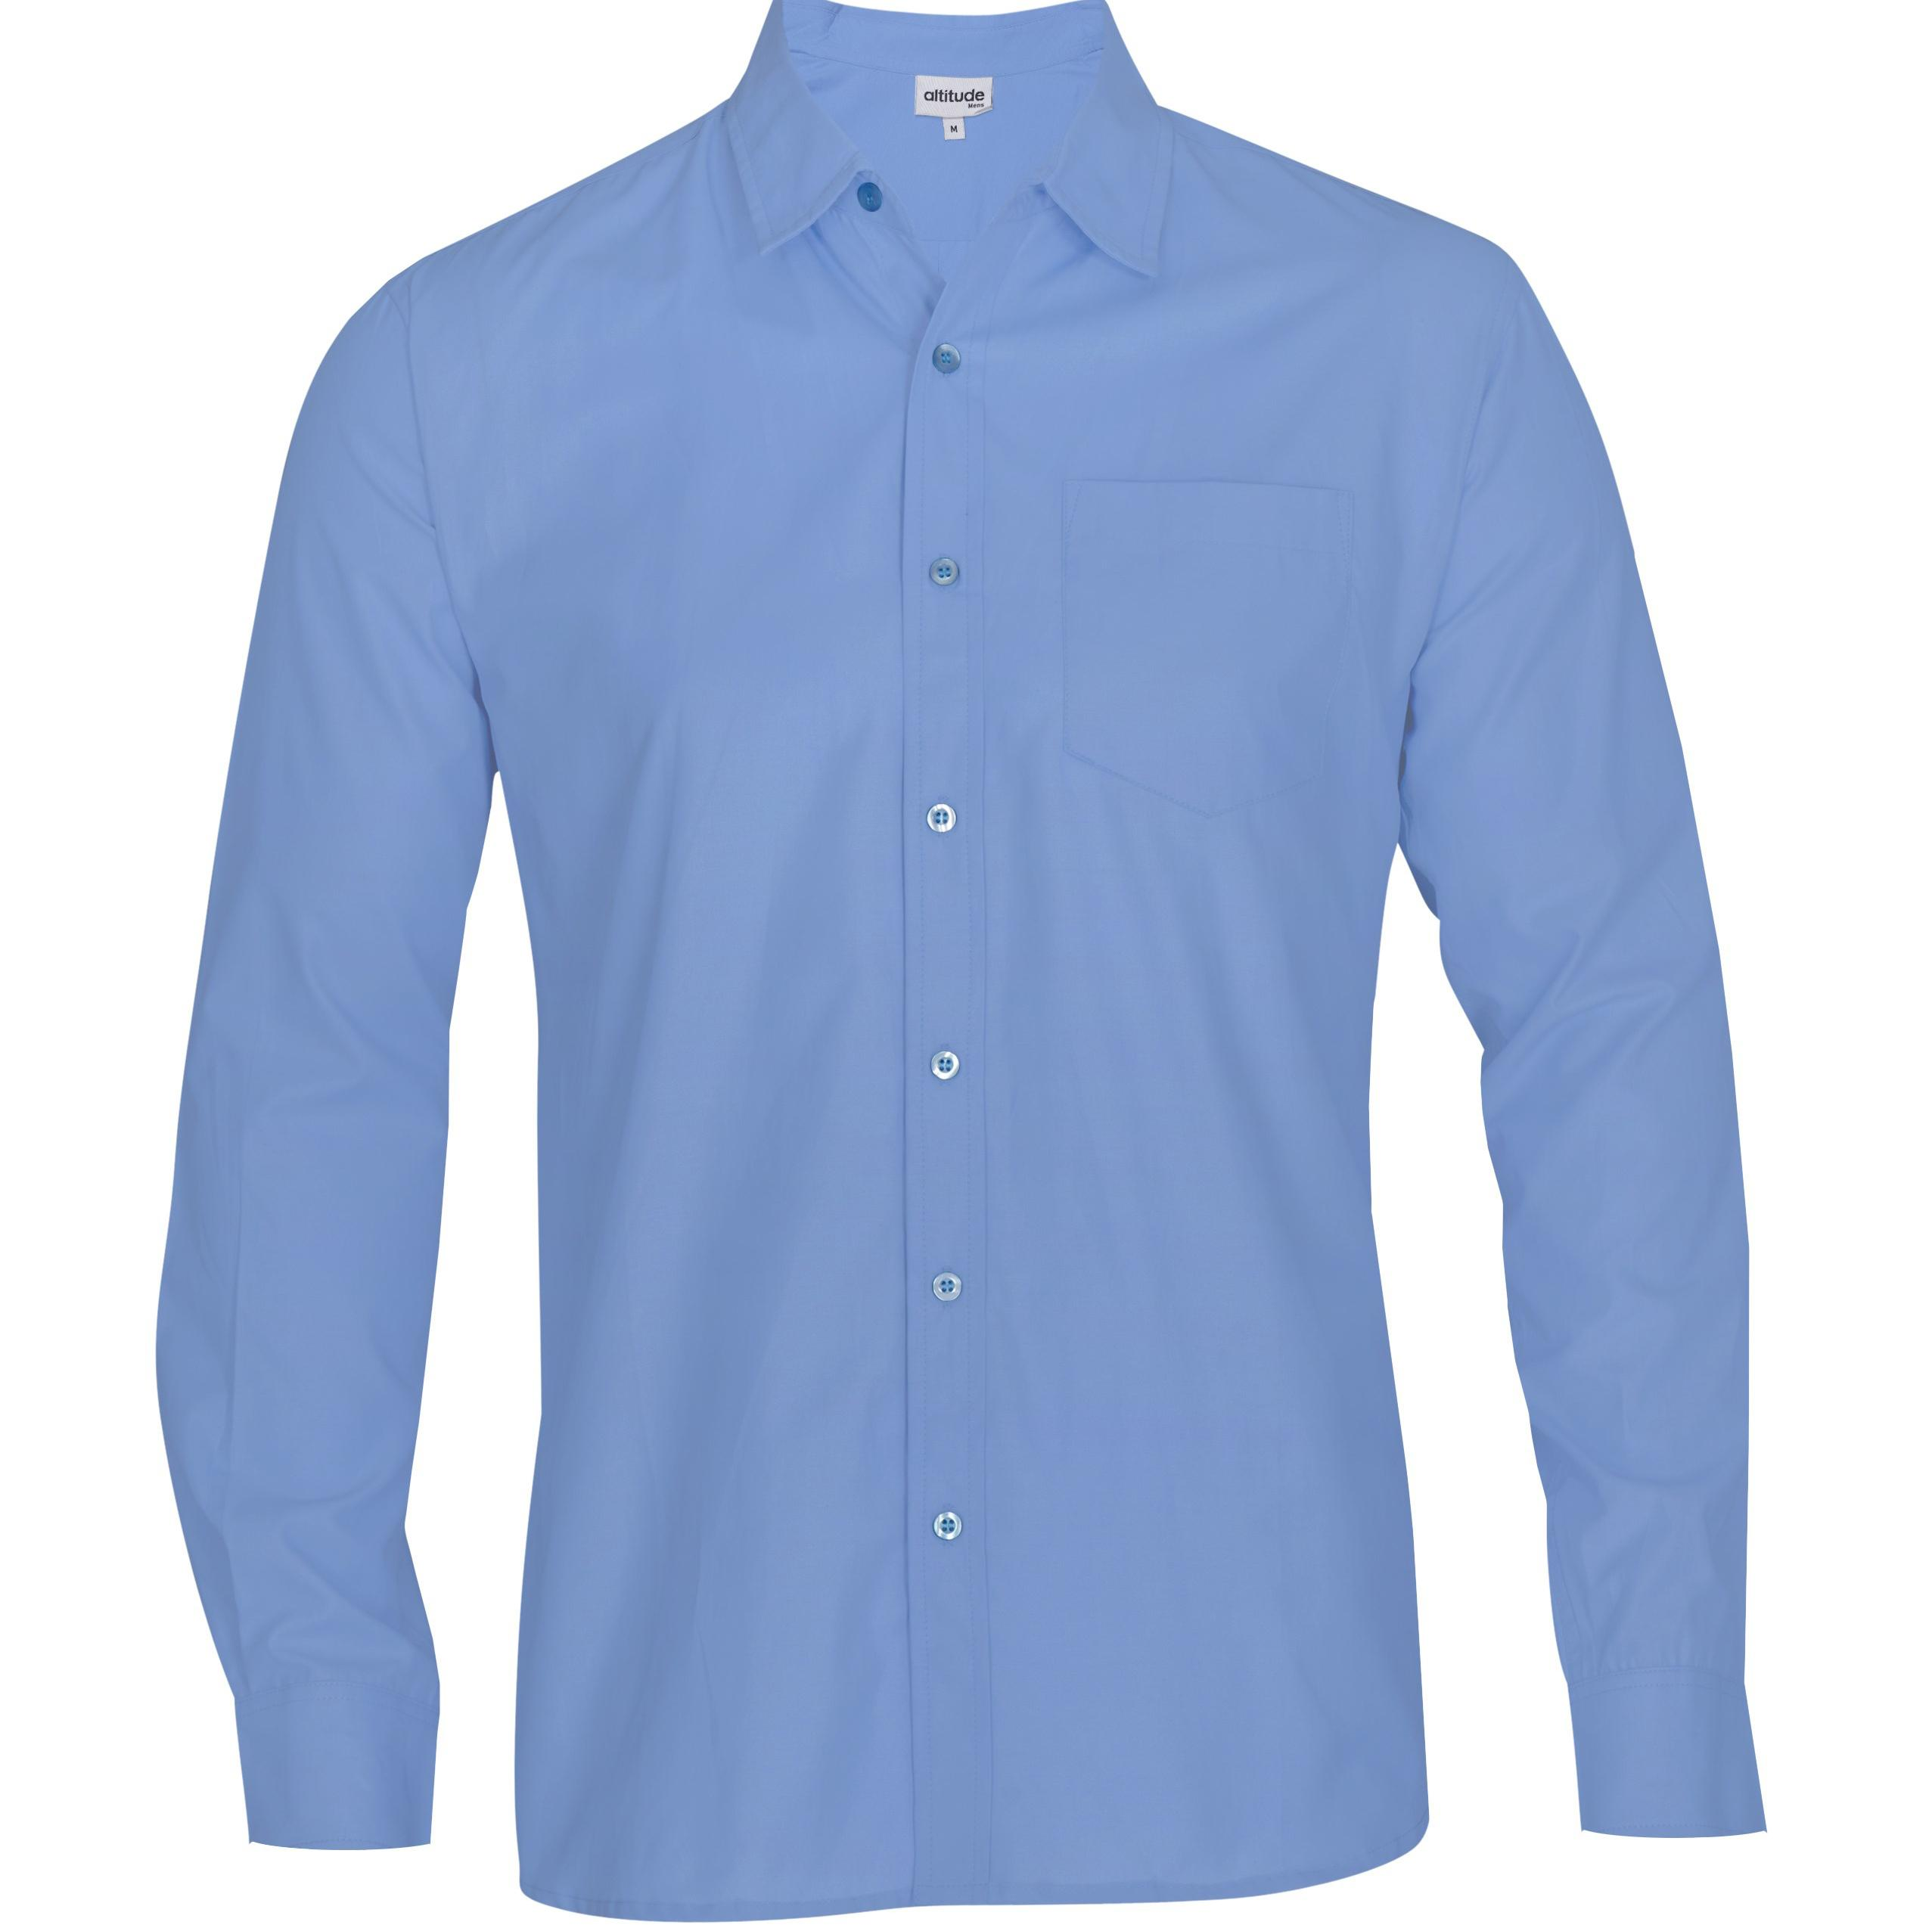 Mens Long Sleeve Catalyst Shirt  - Sky Blue Only